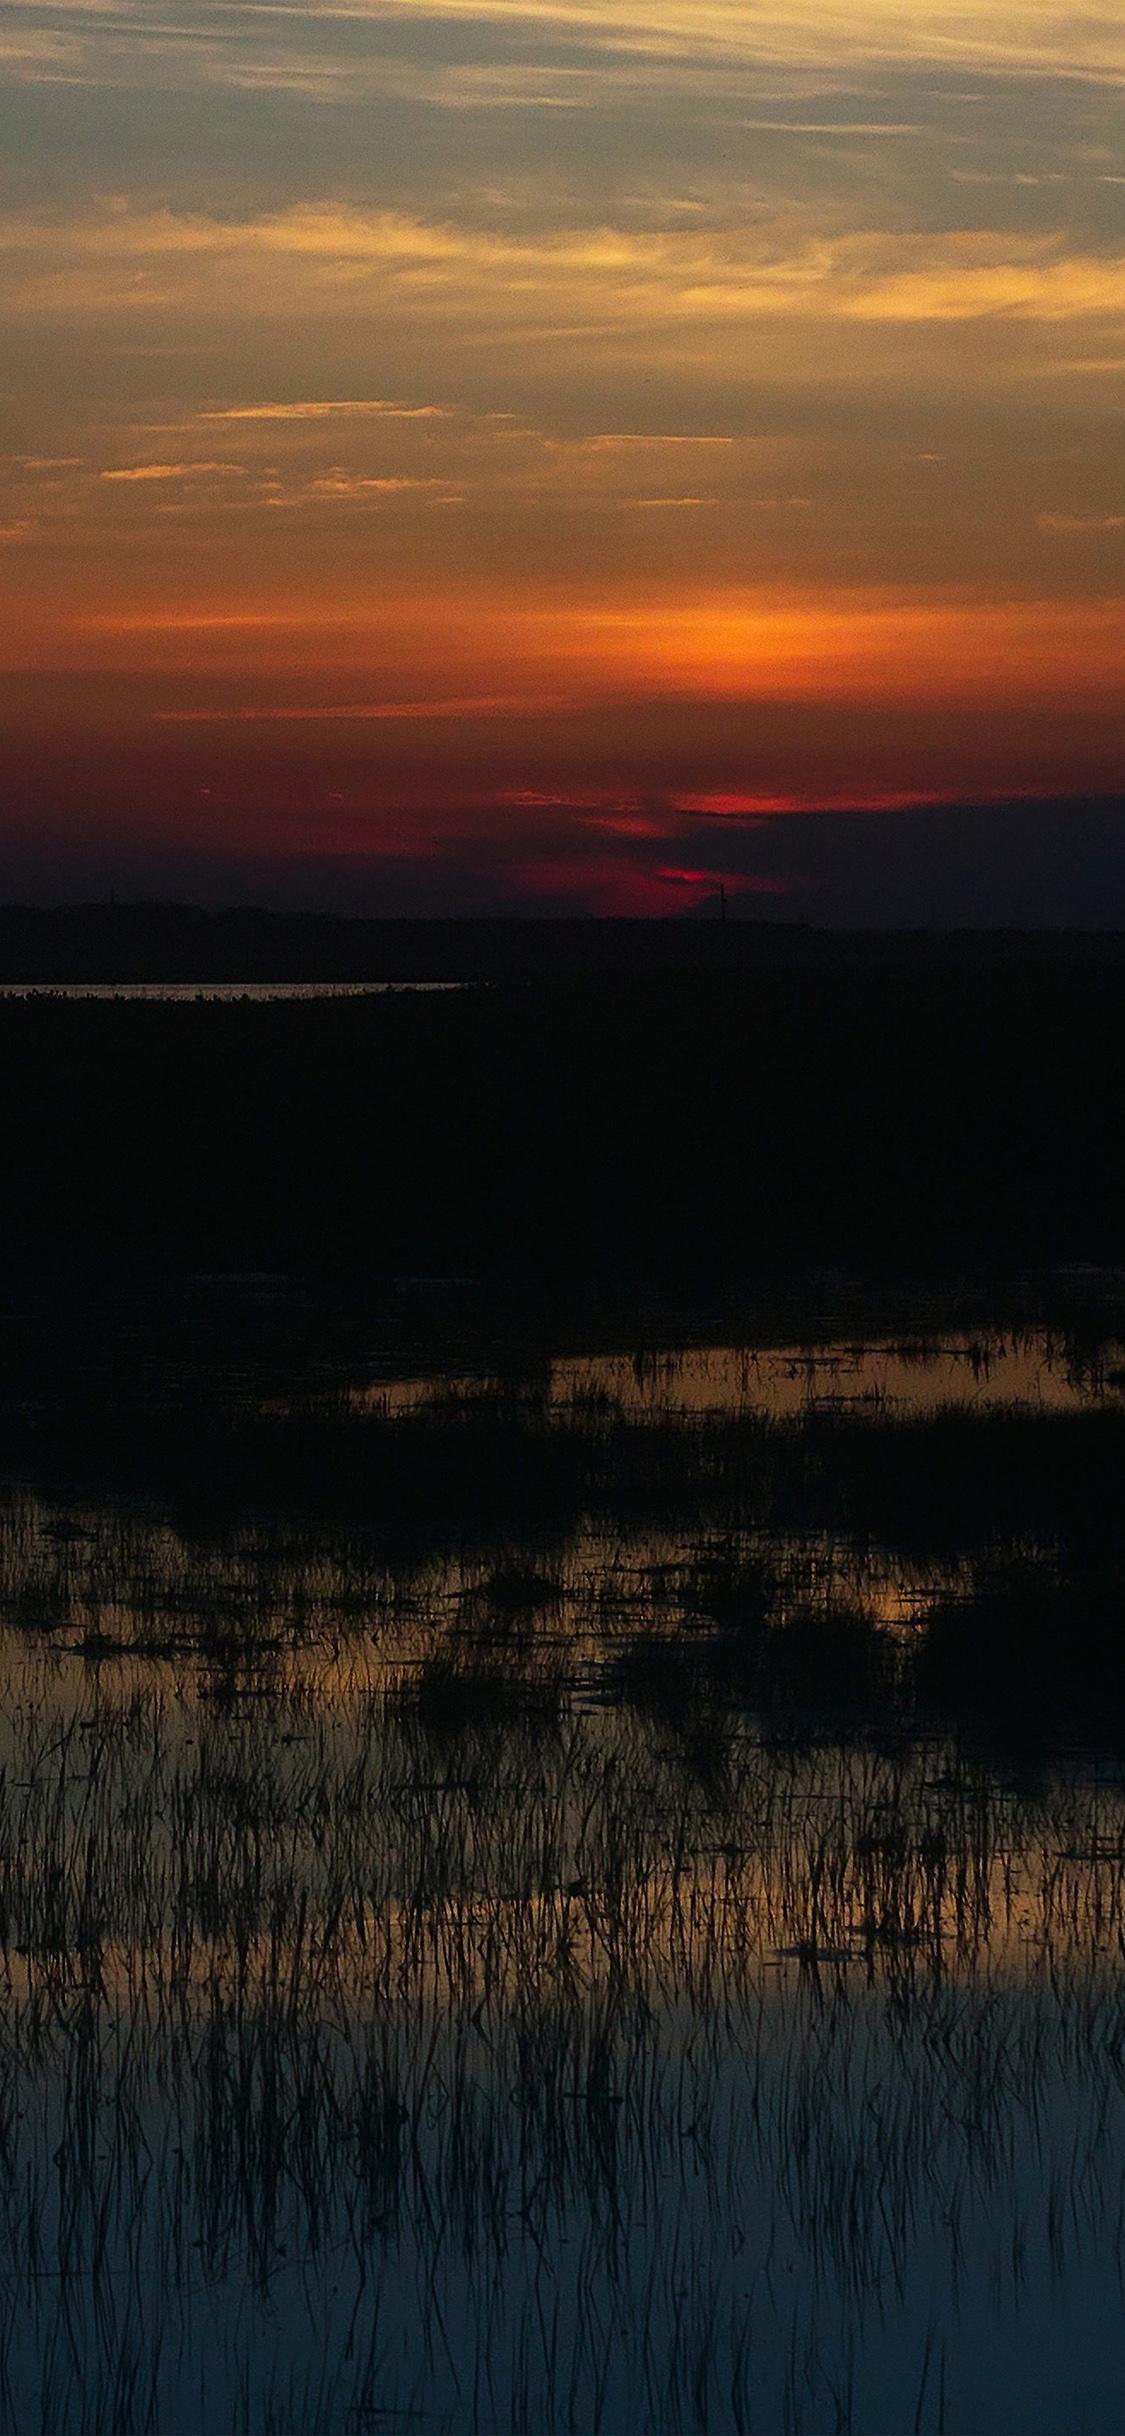 Sunset Lake Mountain Iphone X Wallpapers Free Download